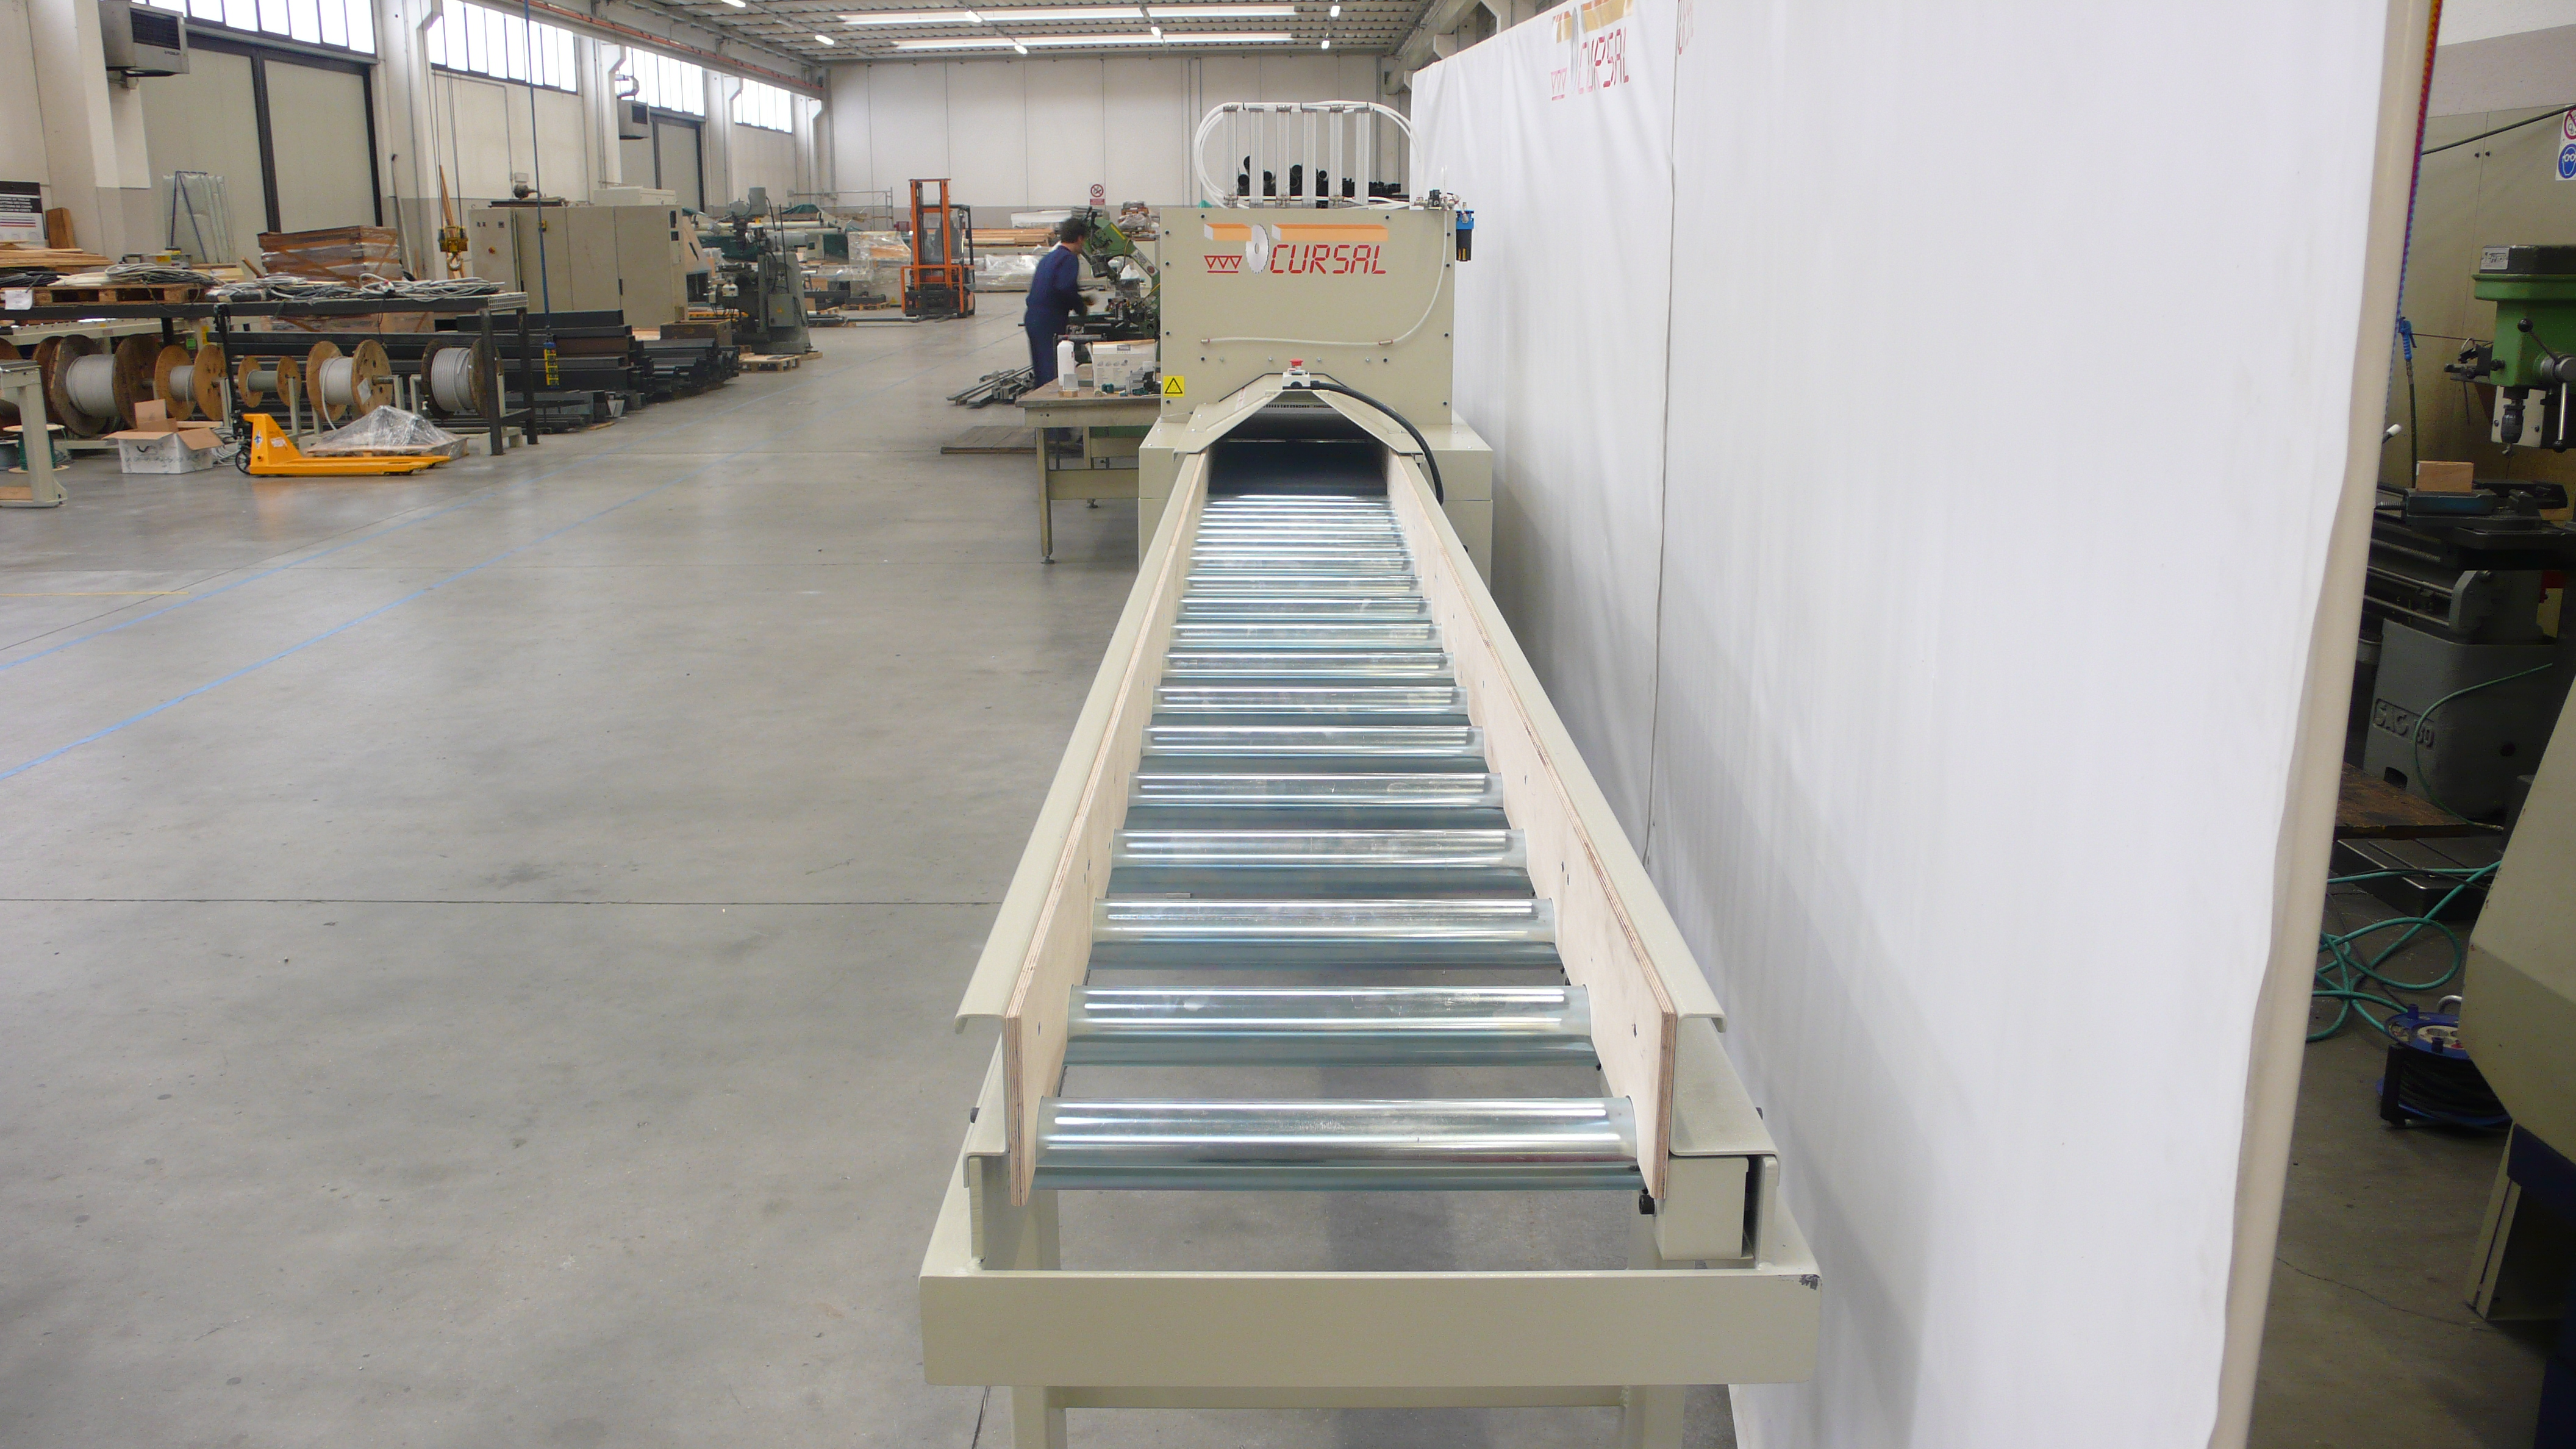 cursal-florian legno-trv 1600L 700 (2)